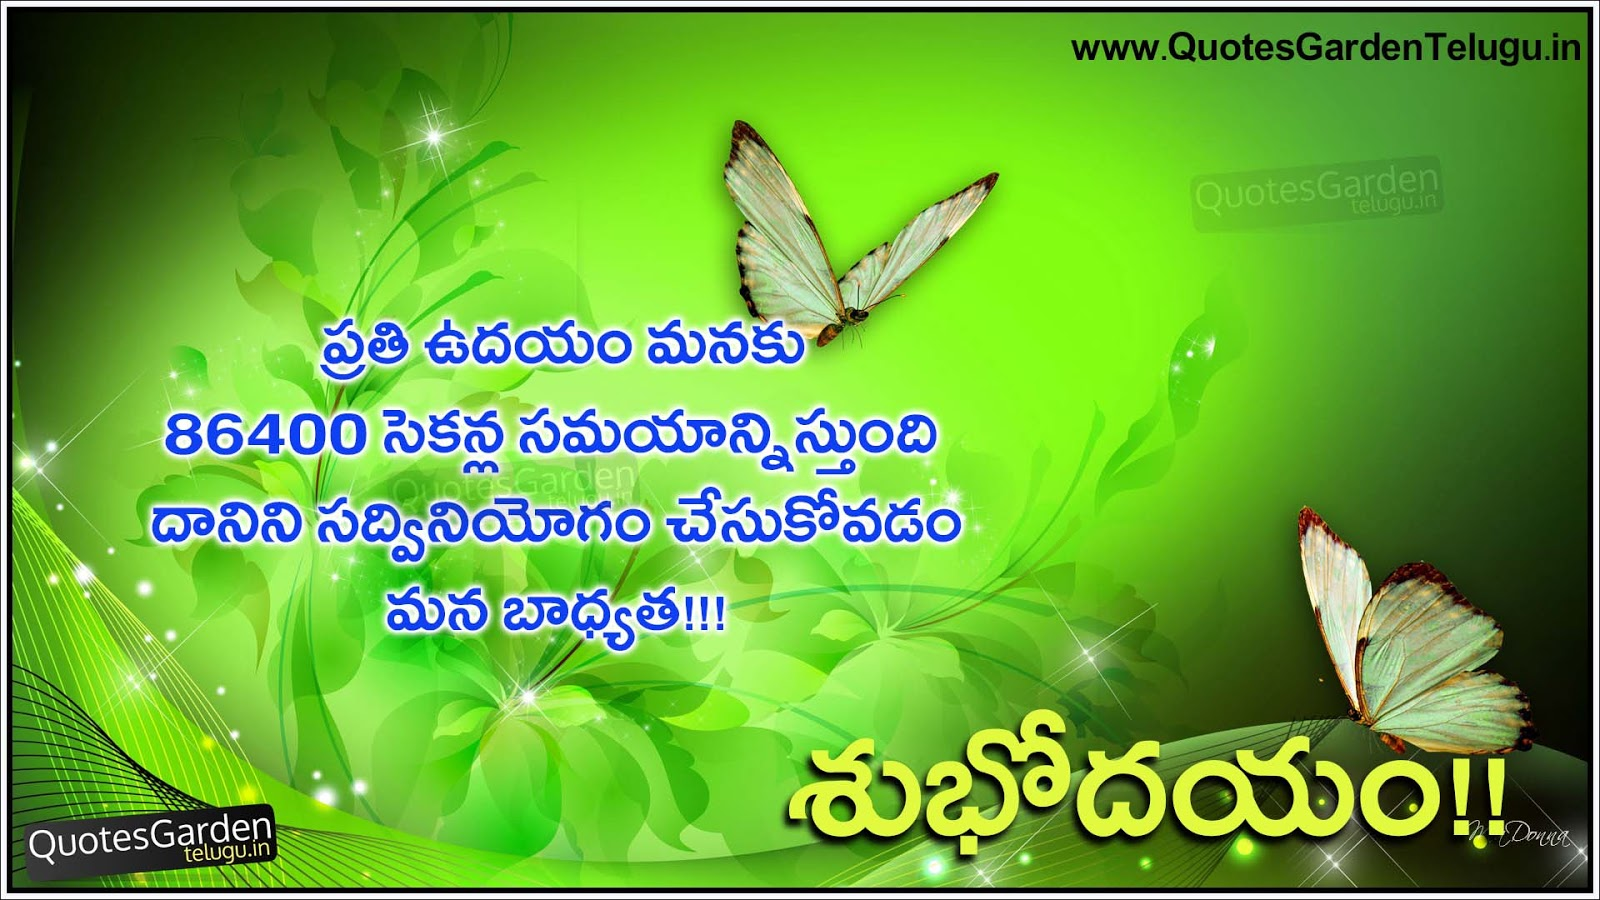 Beautiful Telugu Good mornig messages inspirational quotes